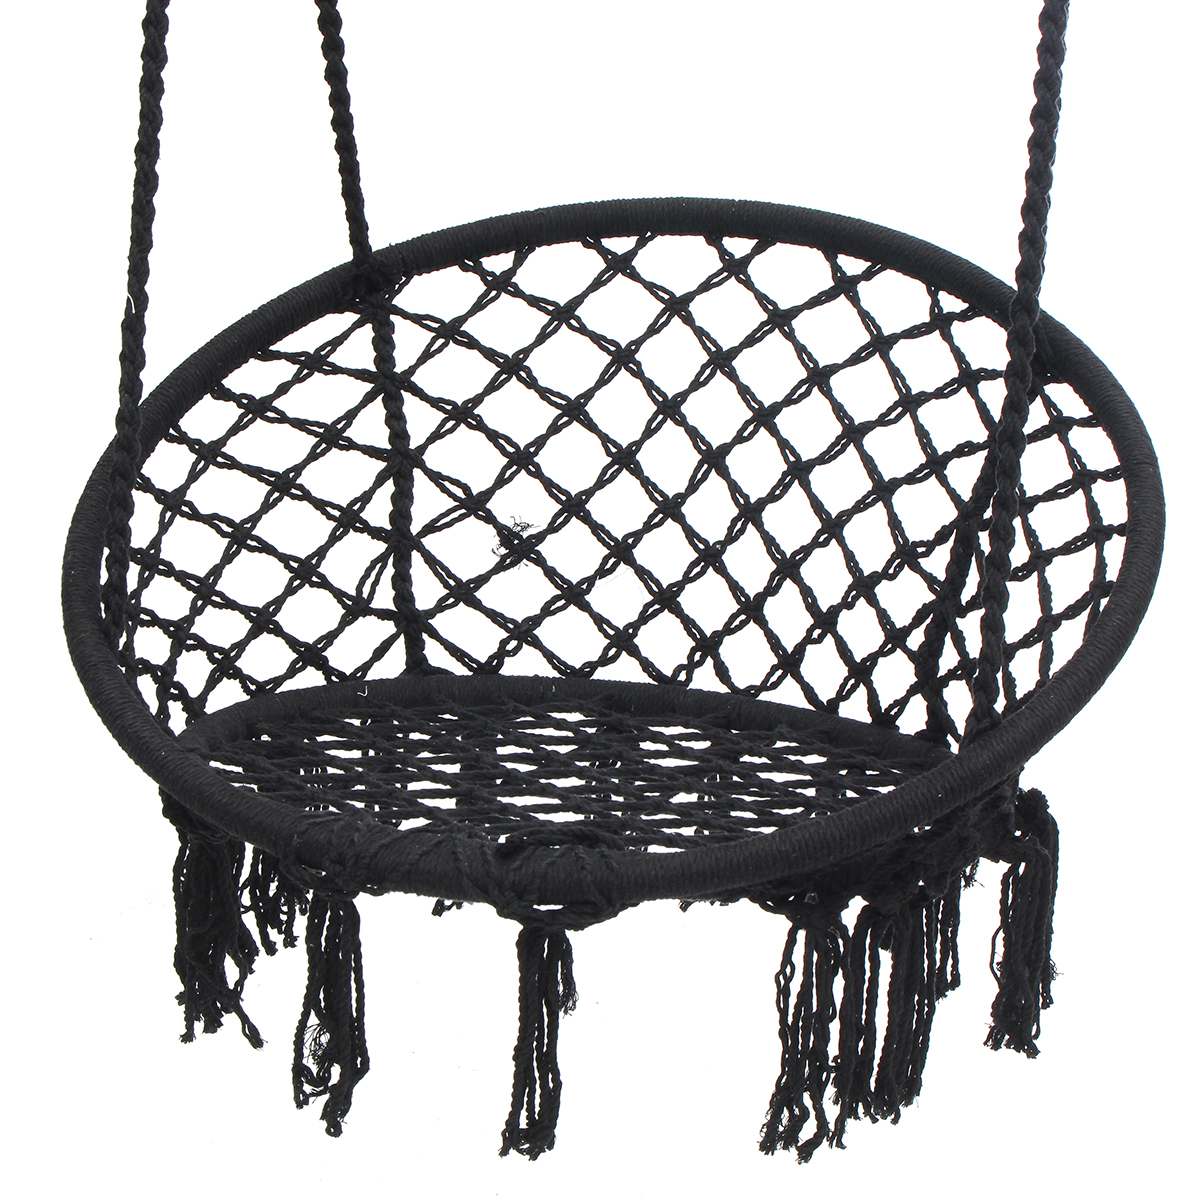 Swing Hanging Chair Black No Hanging Tools